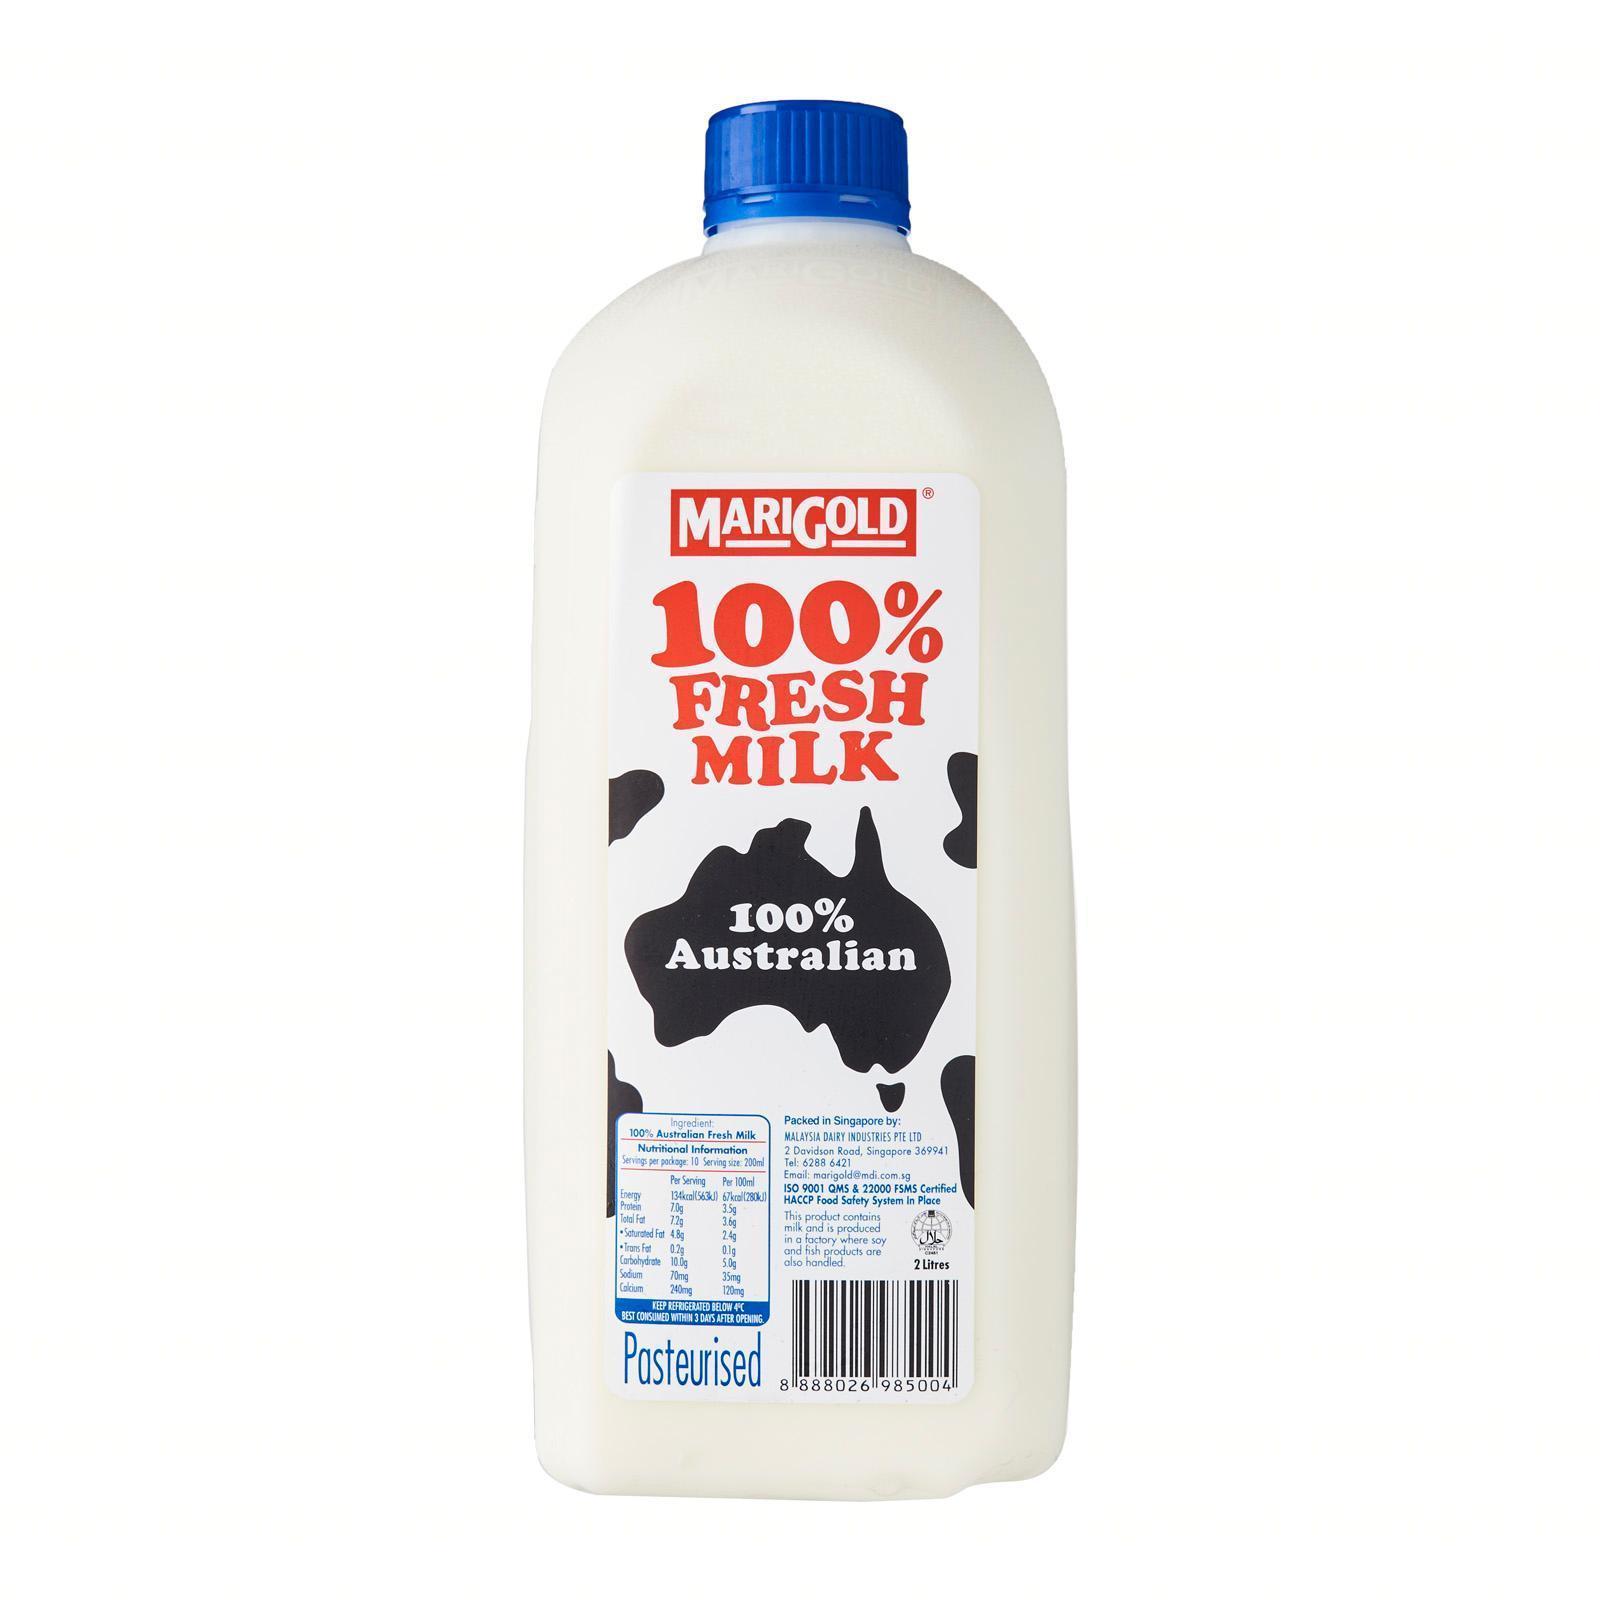 MARIGOLD 100% Fresh Milk Plain 2L